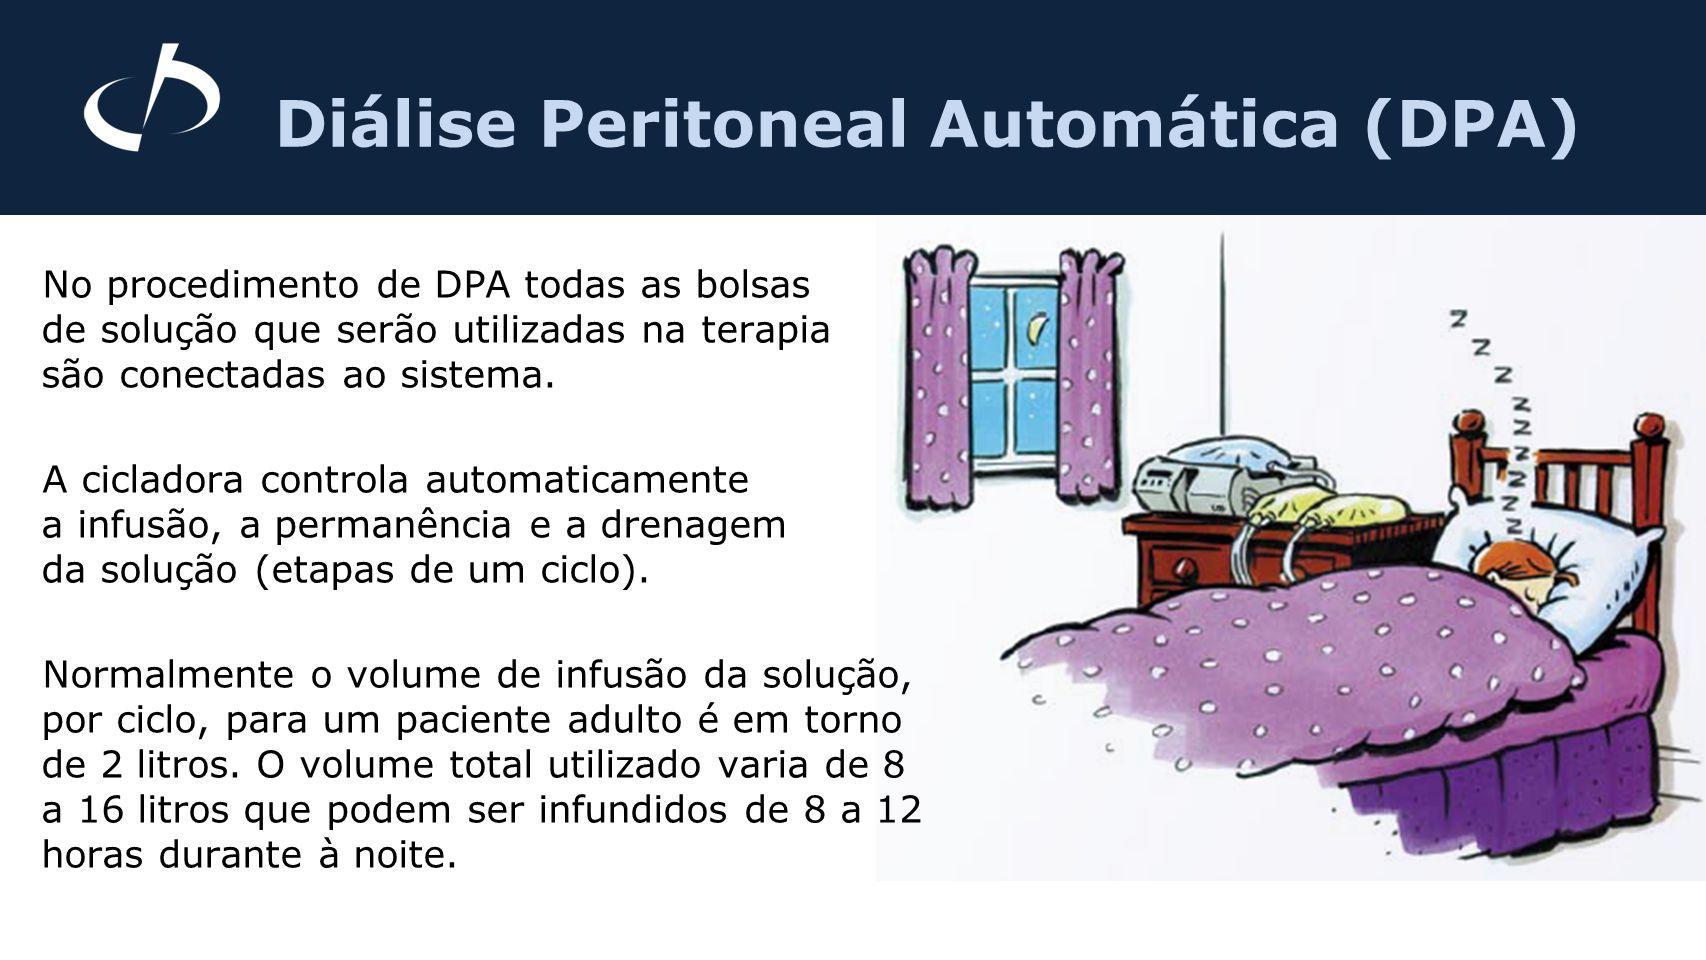 Diálise Peritoneal Automática (DPA)